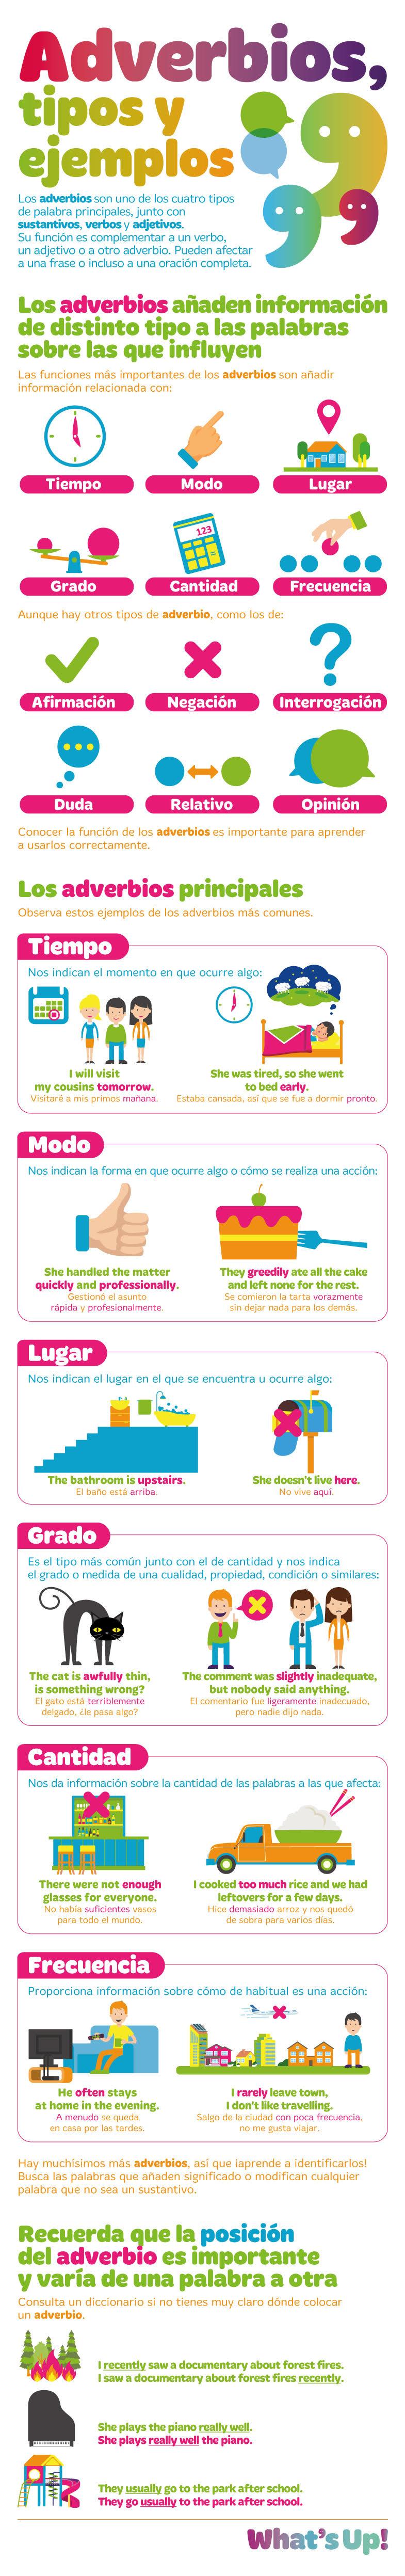 Infografia-adverbios